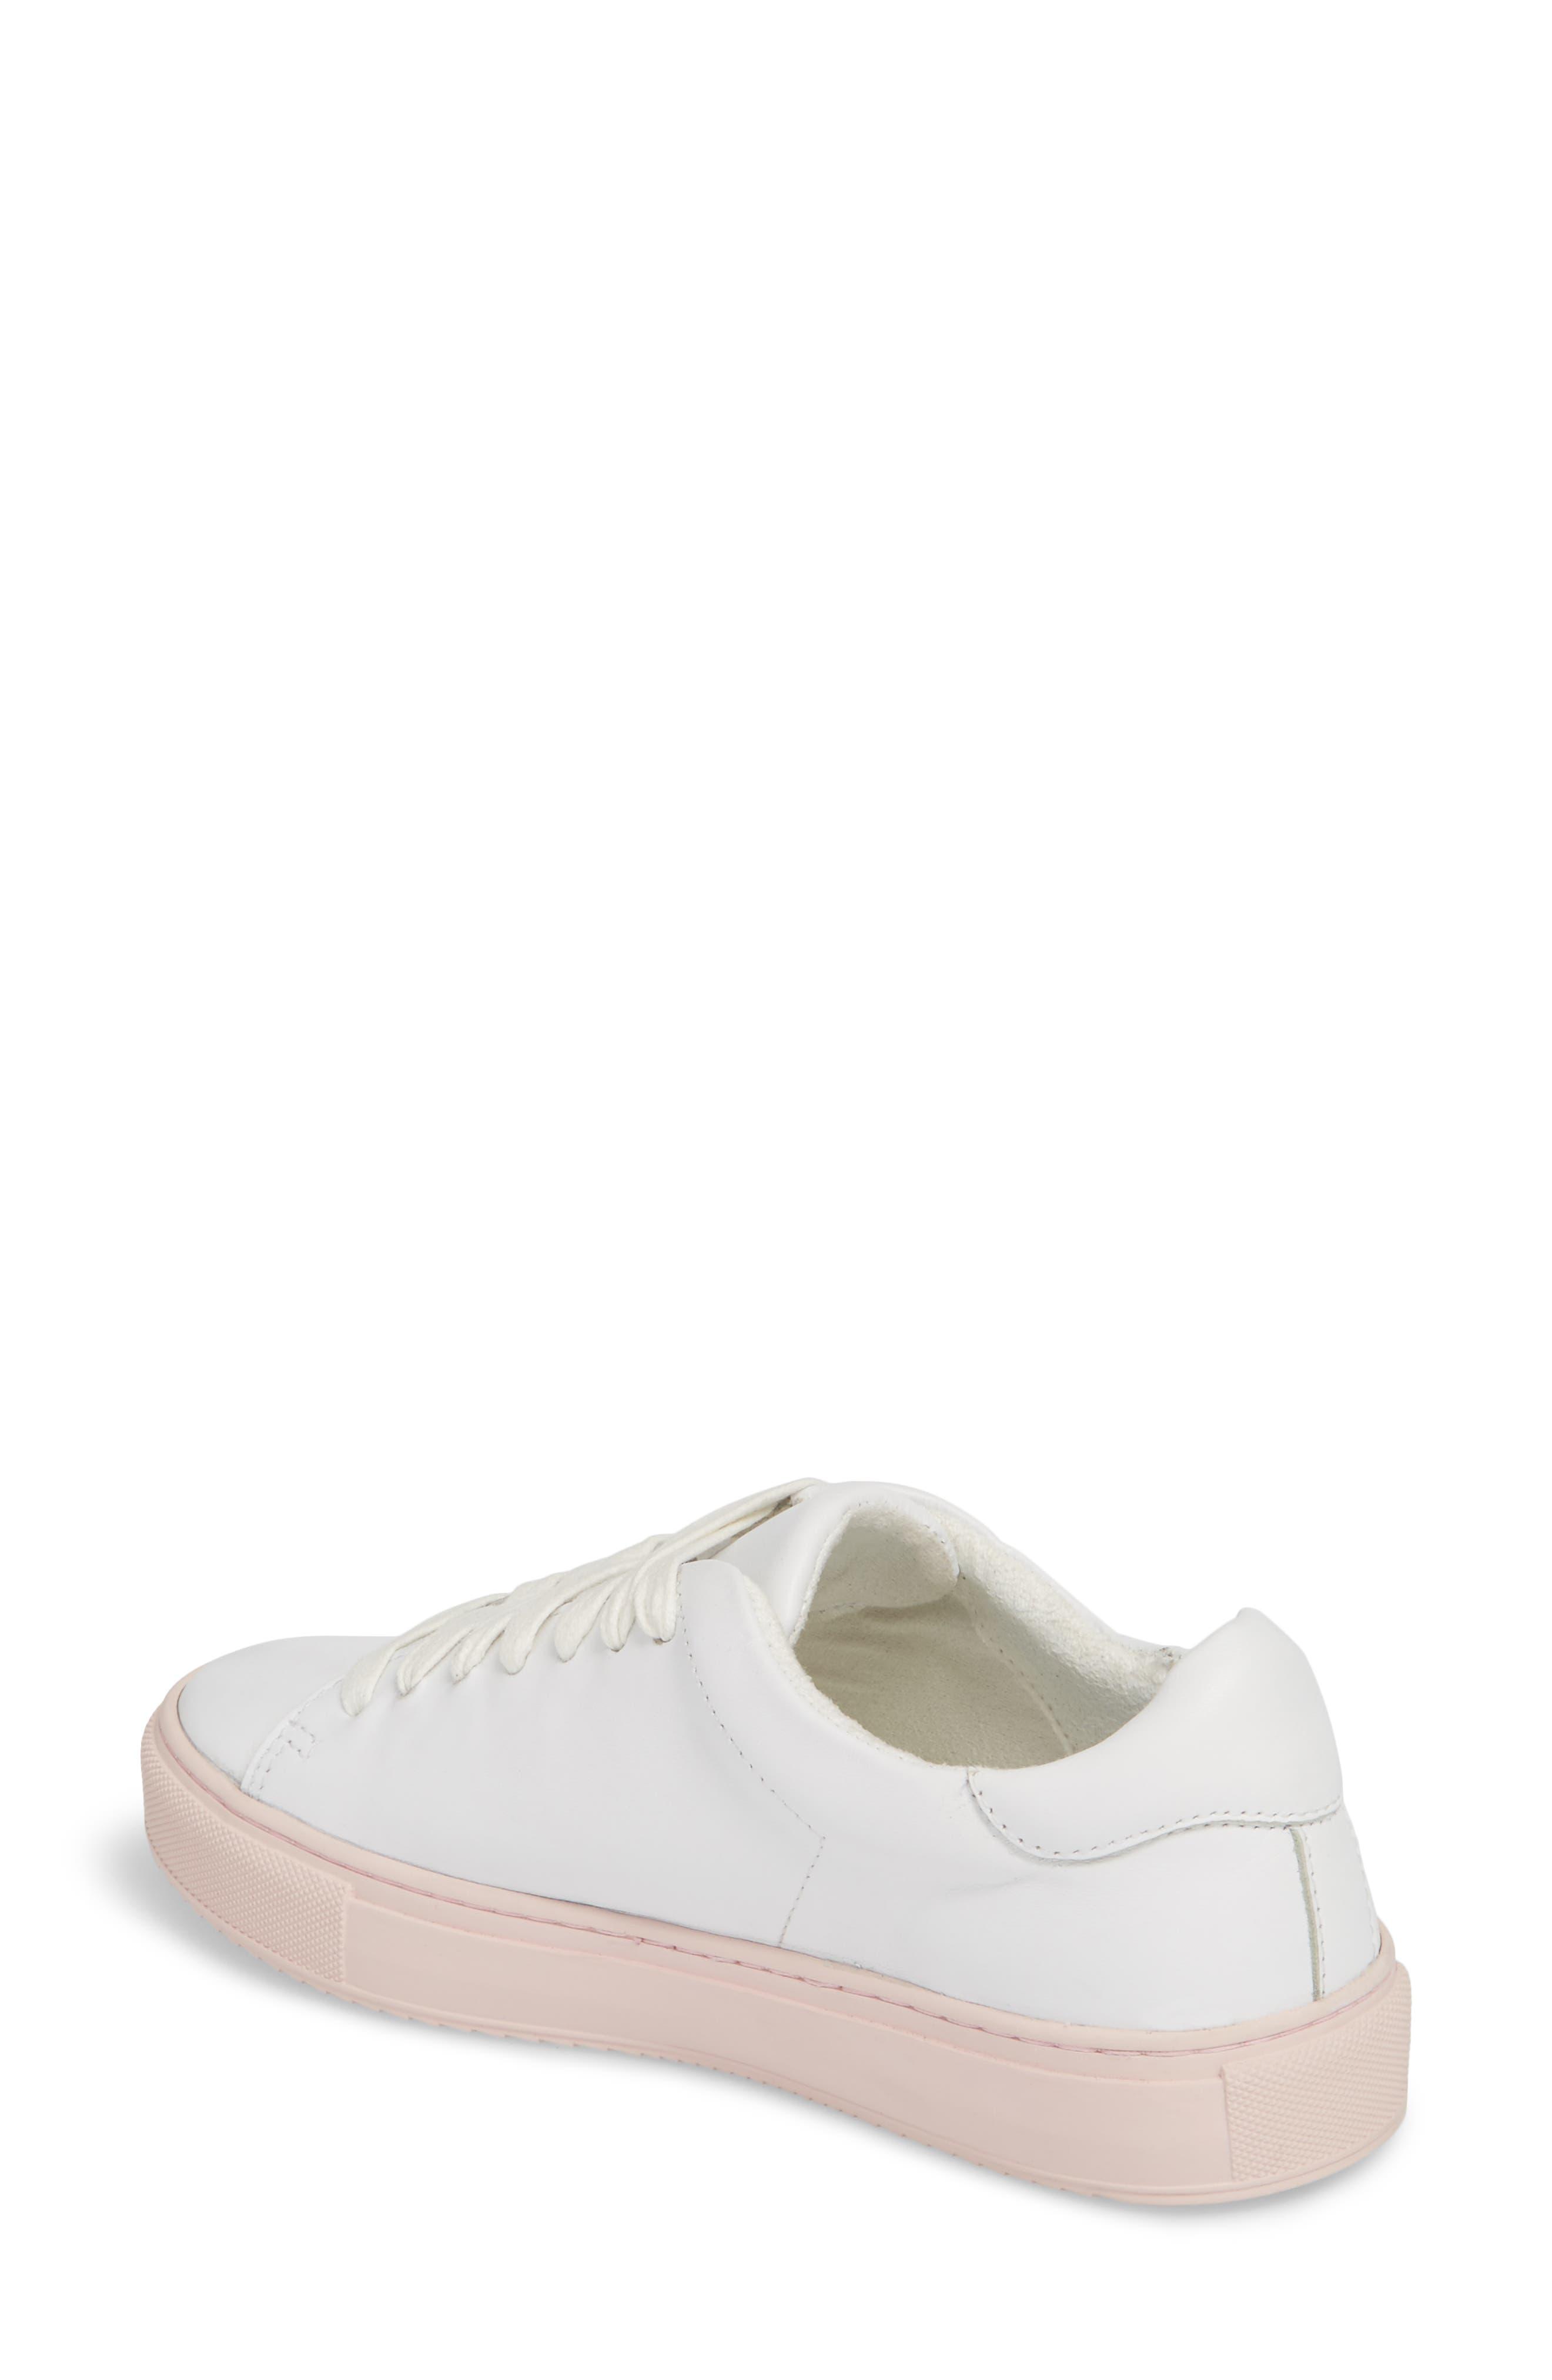 Cassidy Sneaker,                             Alternate thumbnail 2, color,                             100